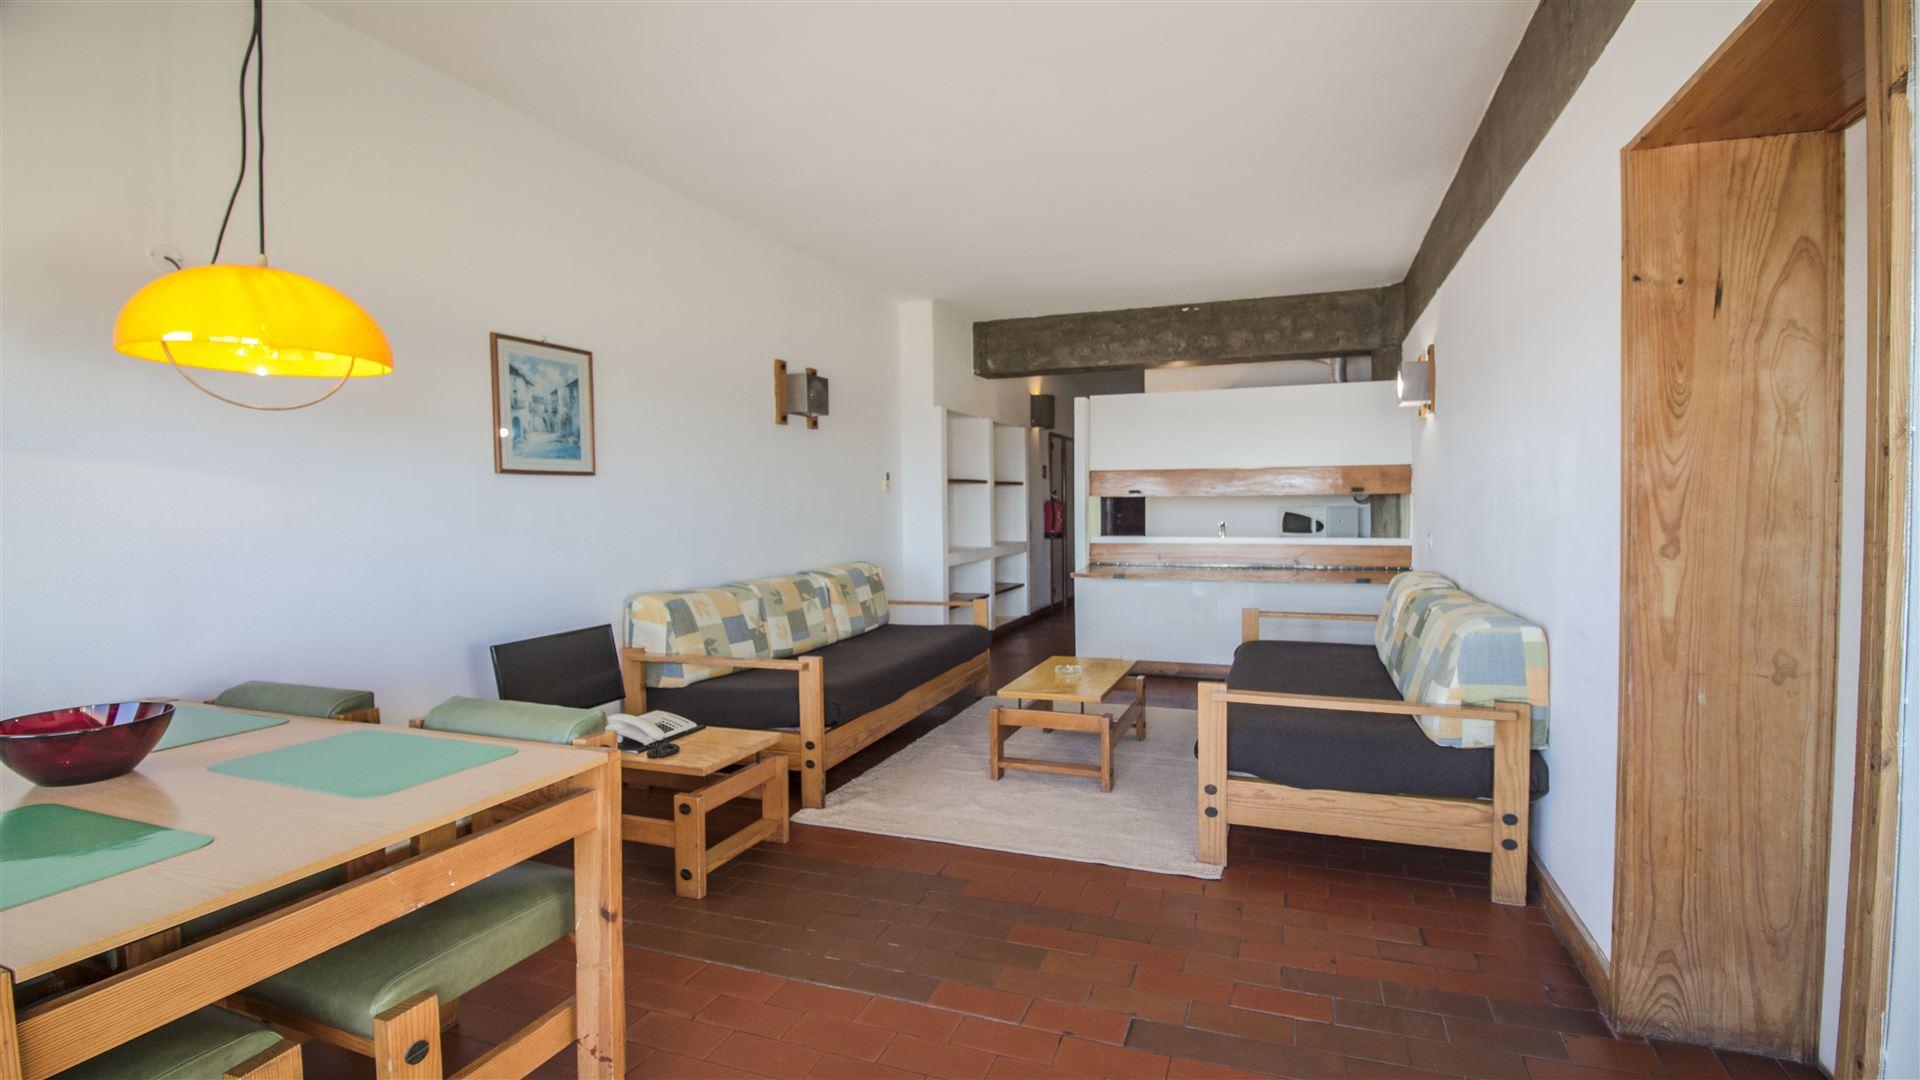 Wohnung 1 Schlafzimmer - Algarve, Monte Gordo, Vila Real de Santo António